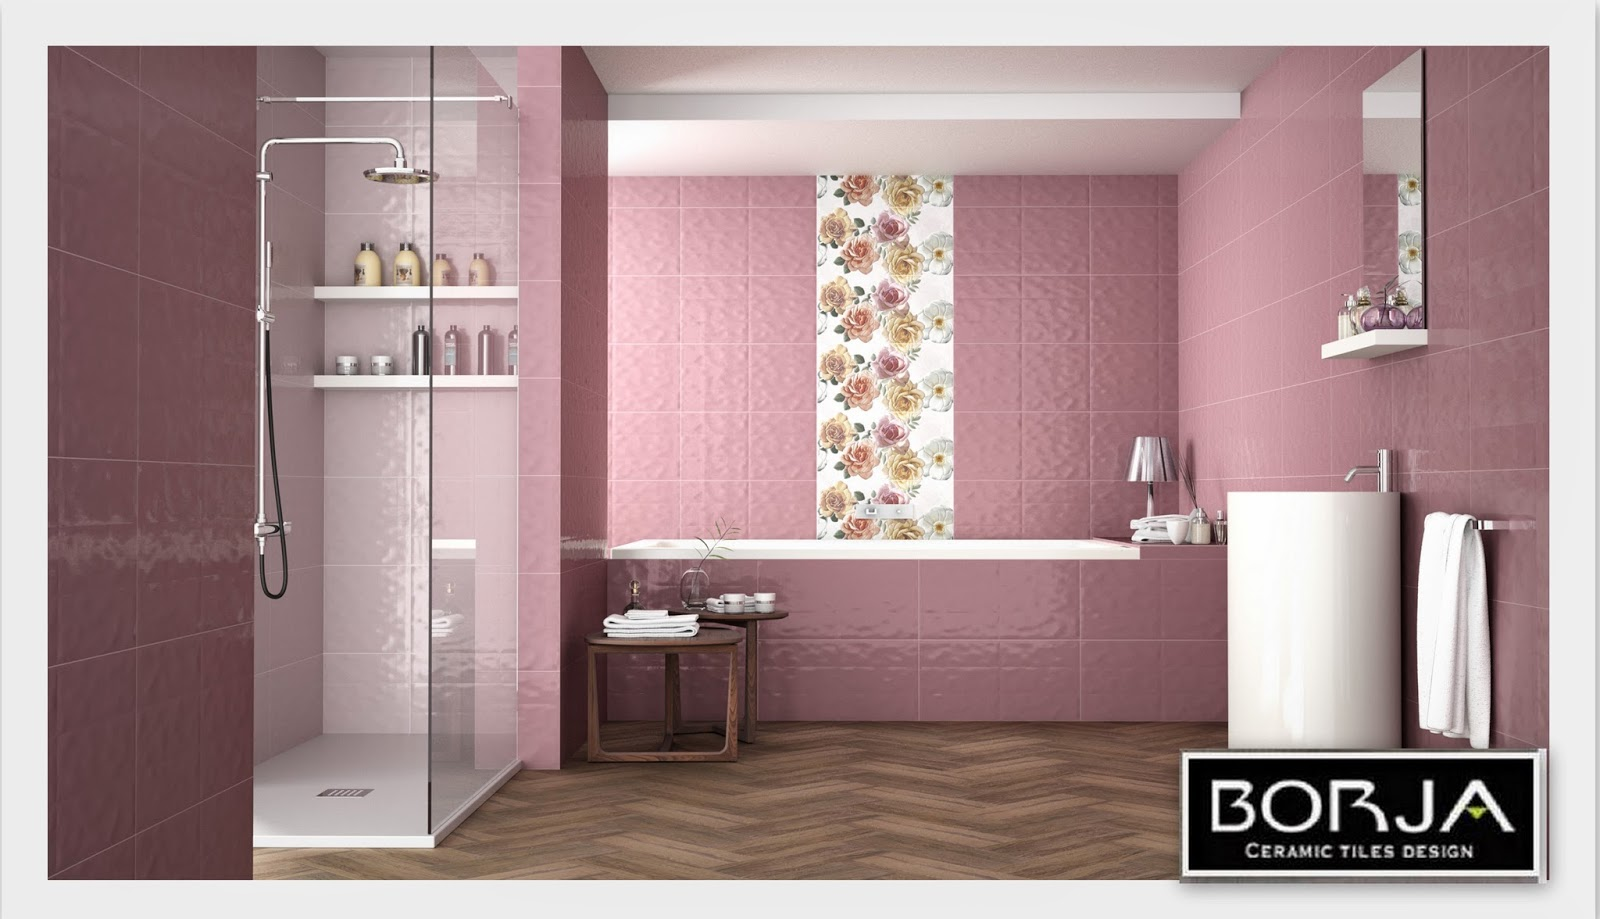 Borja ceramic tiles design combination decor bristol 30x60 and langley white 30x60 dailygadgetfo Choice Image